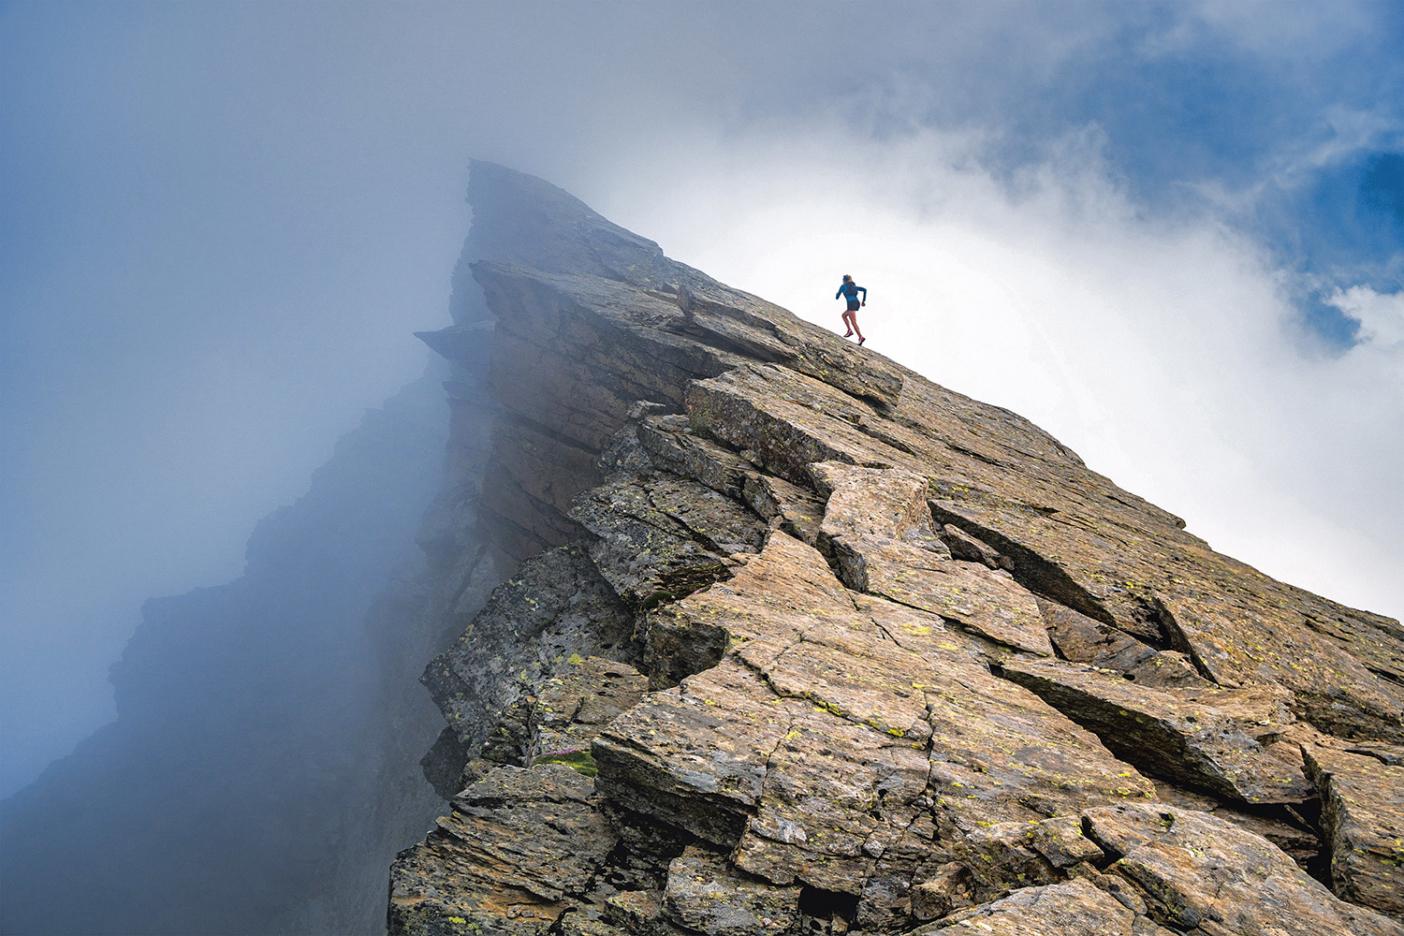 Ким Стром бежит по скалистому хребту над Saas-Almagell, Щвейцария. Фото: Dan Patitucci